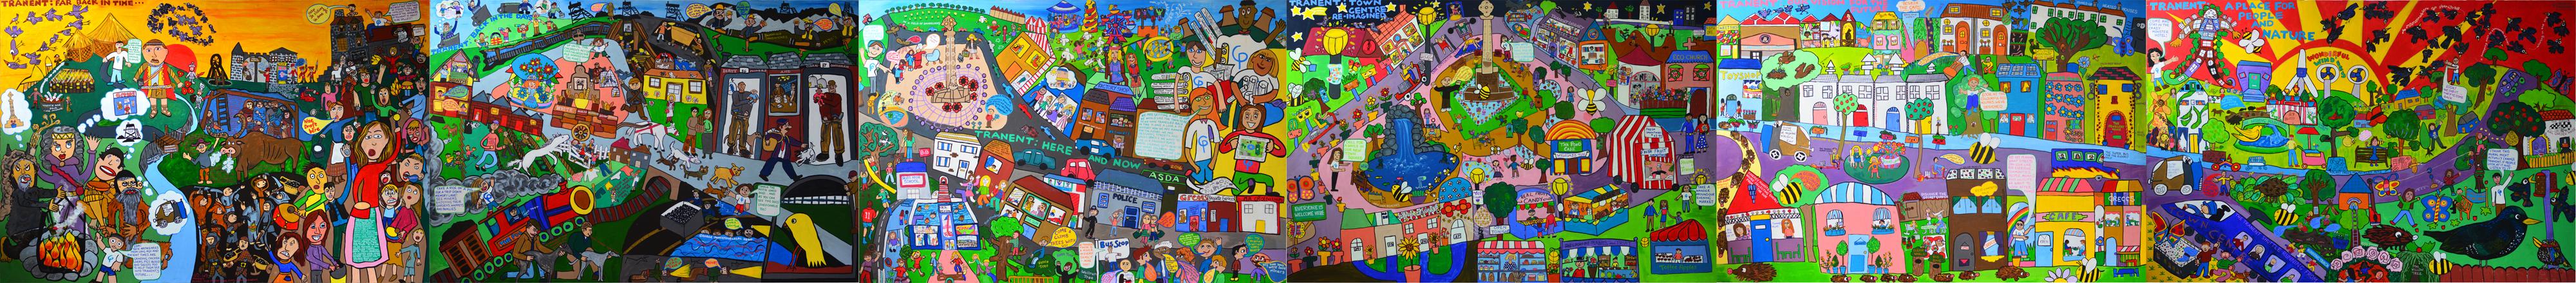 StreetsAhead Tranent Mural (2016)